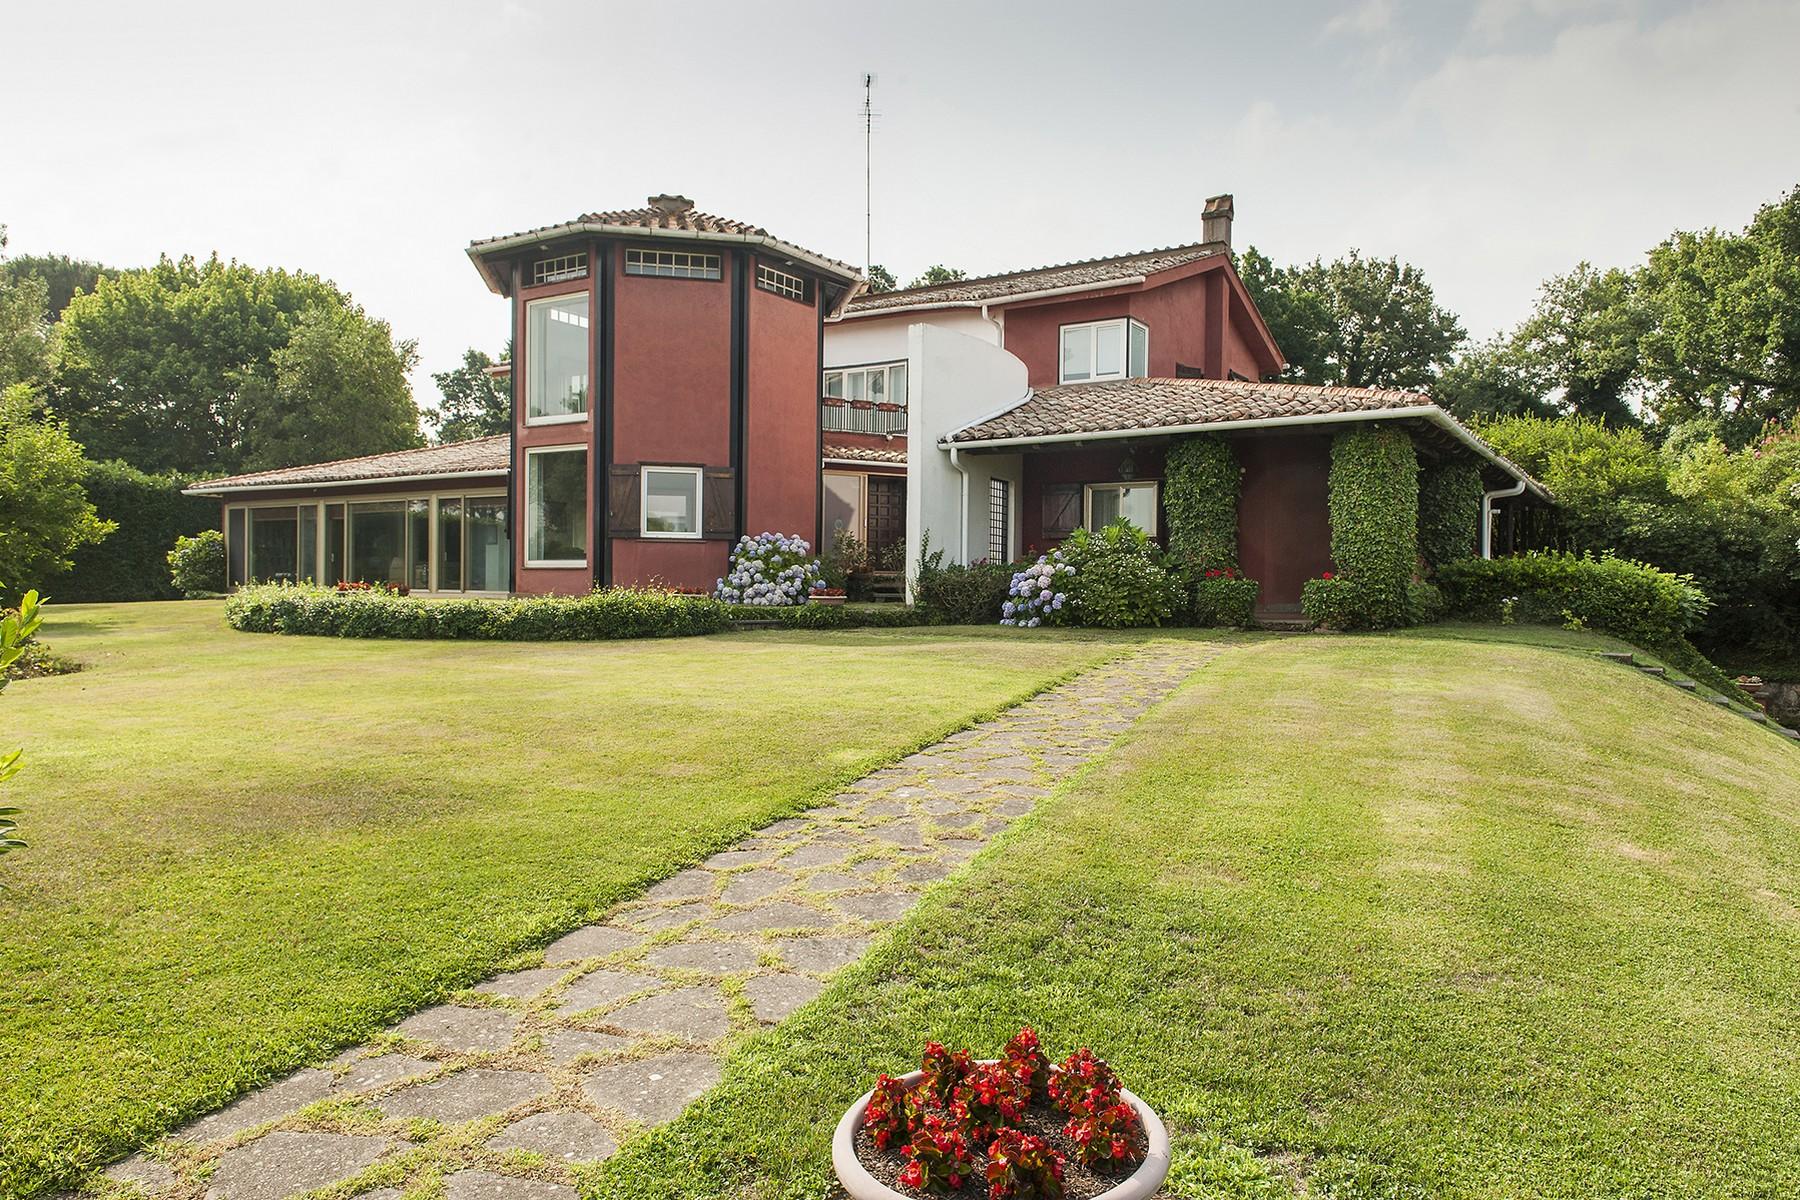 Single Family Home for Sale at Beautiful designed Villa at Olgiata Largo dell'Olgiata Rome, Rome 00123 Italy